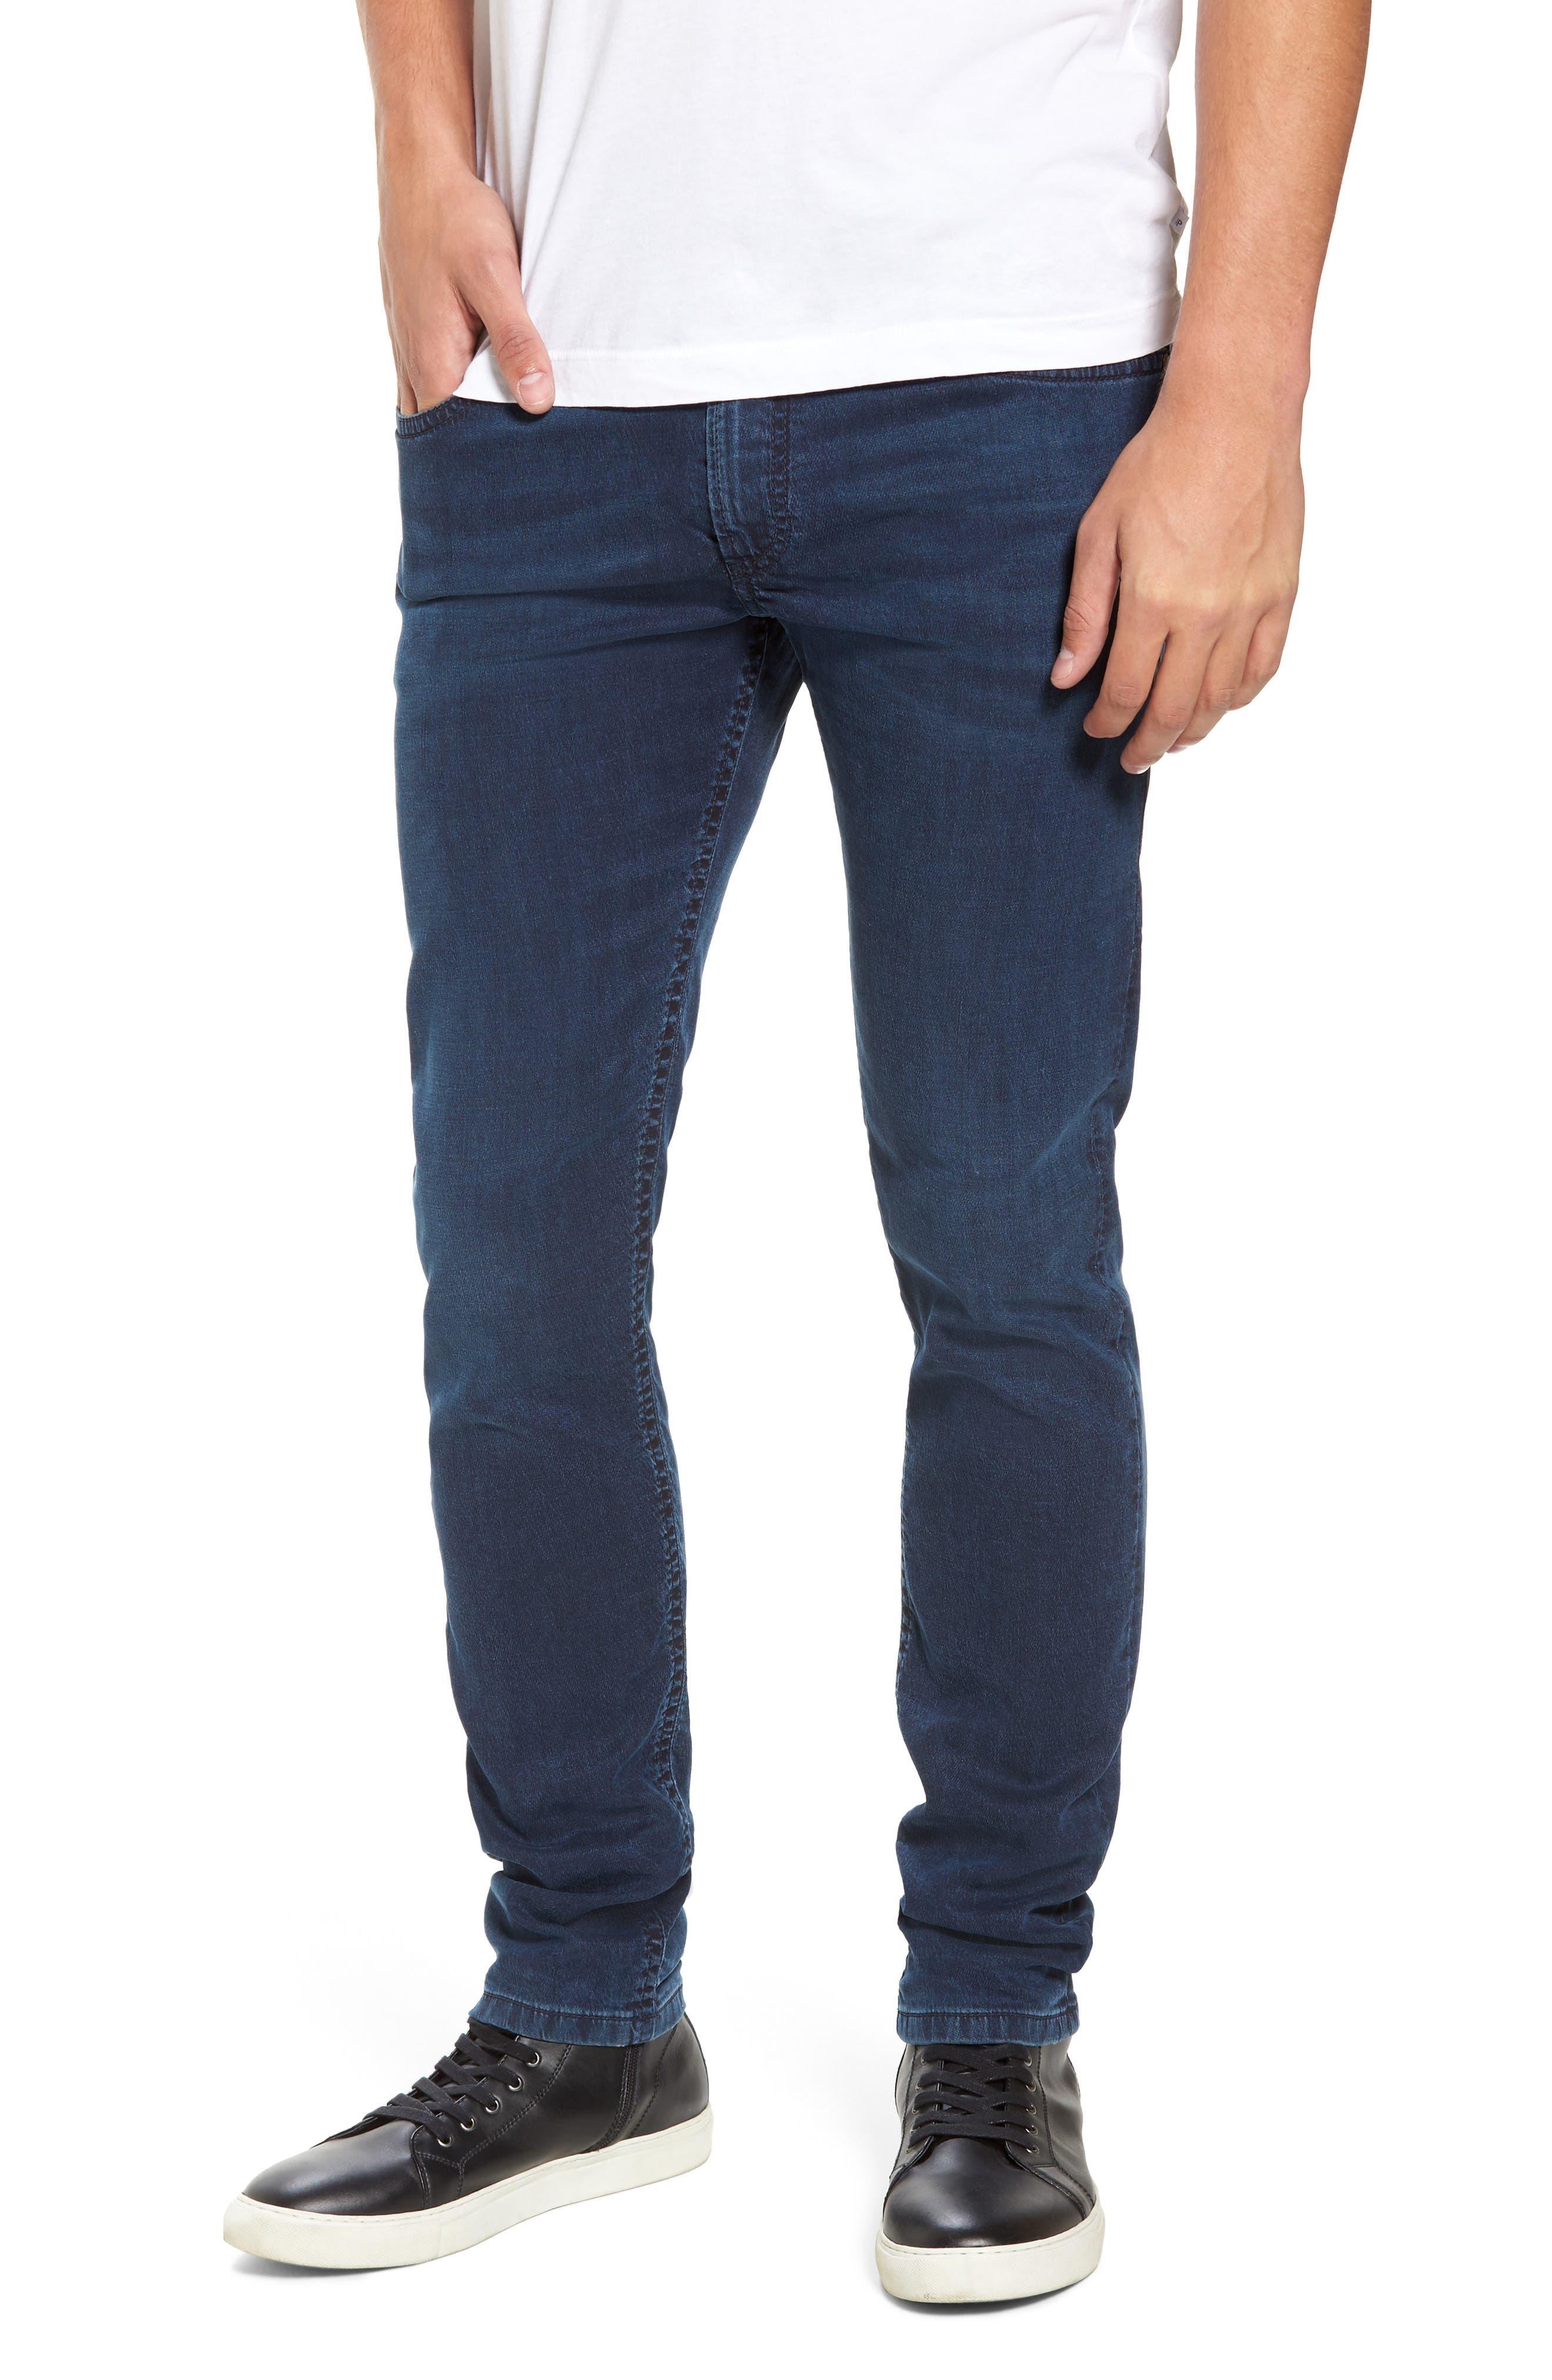 Thommer Slim Fit Jeans,                         Main,                         color, 0688J